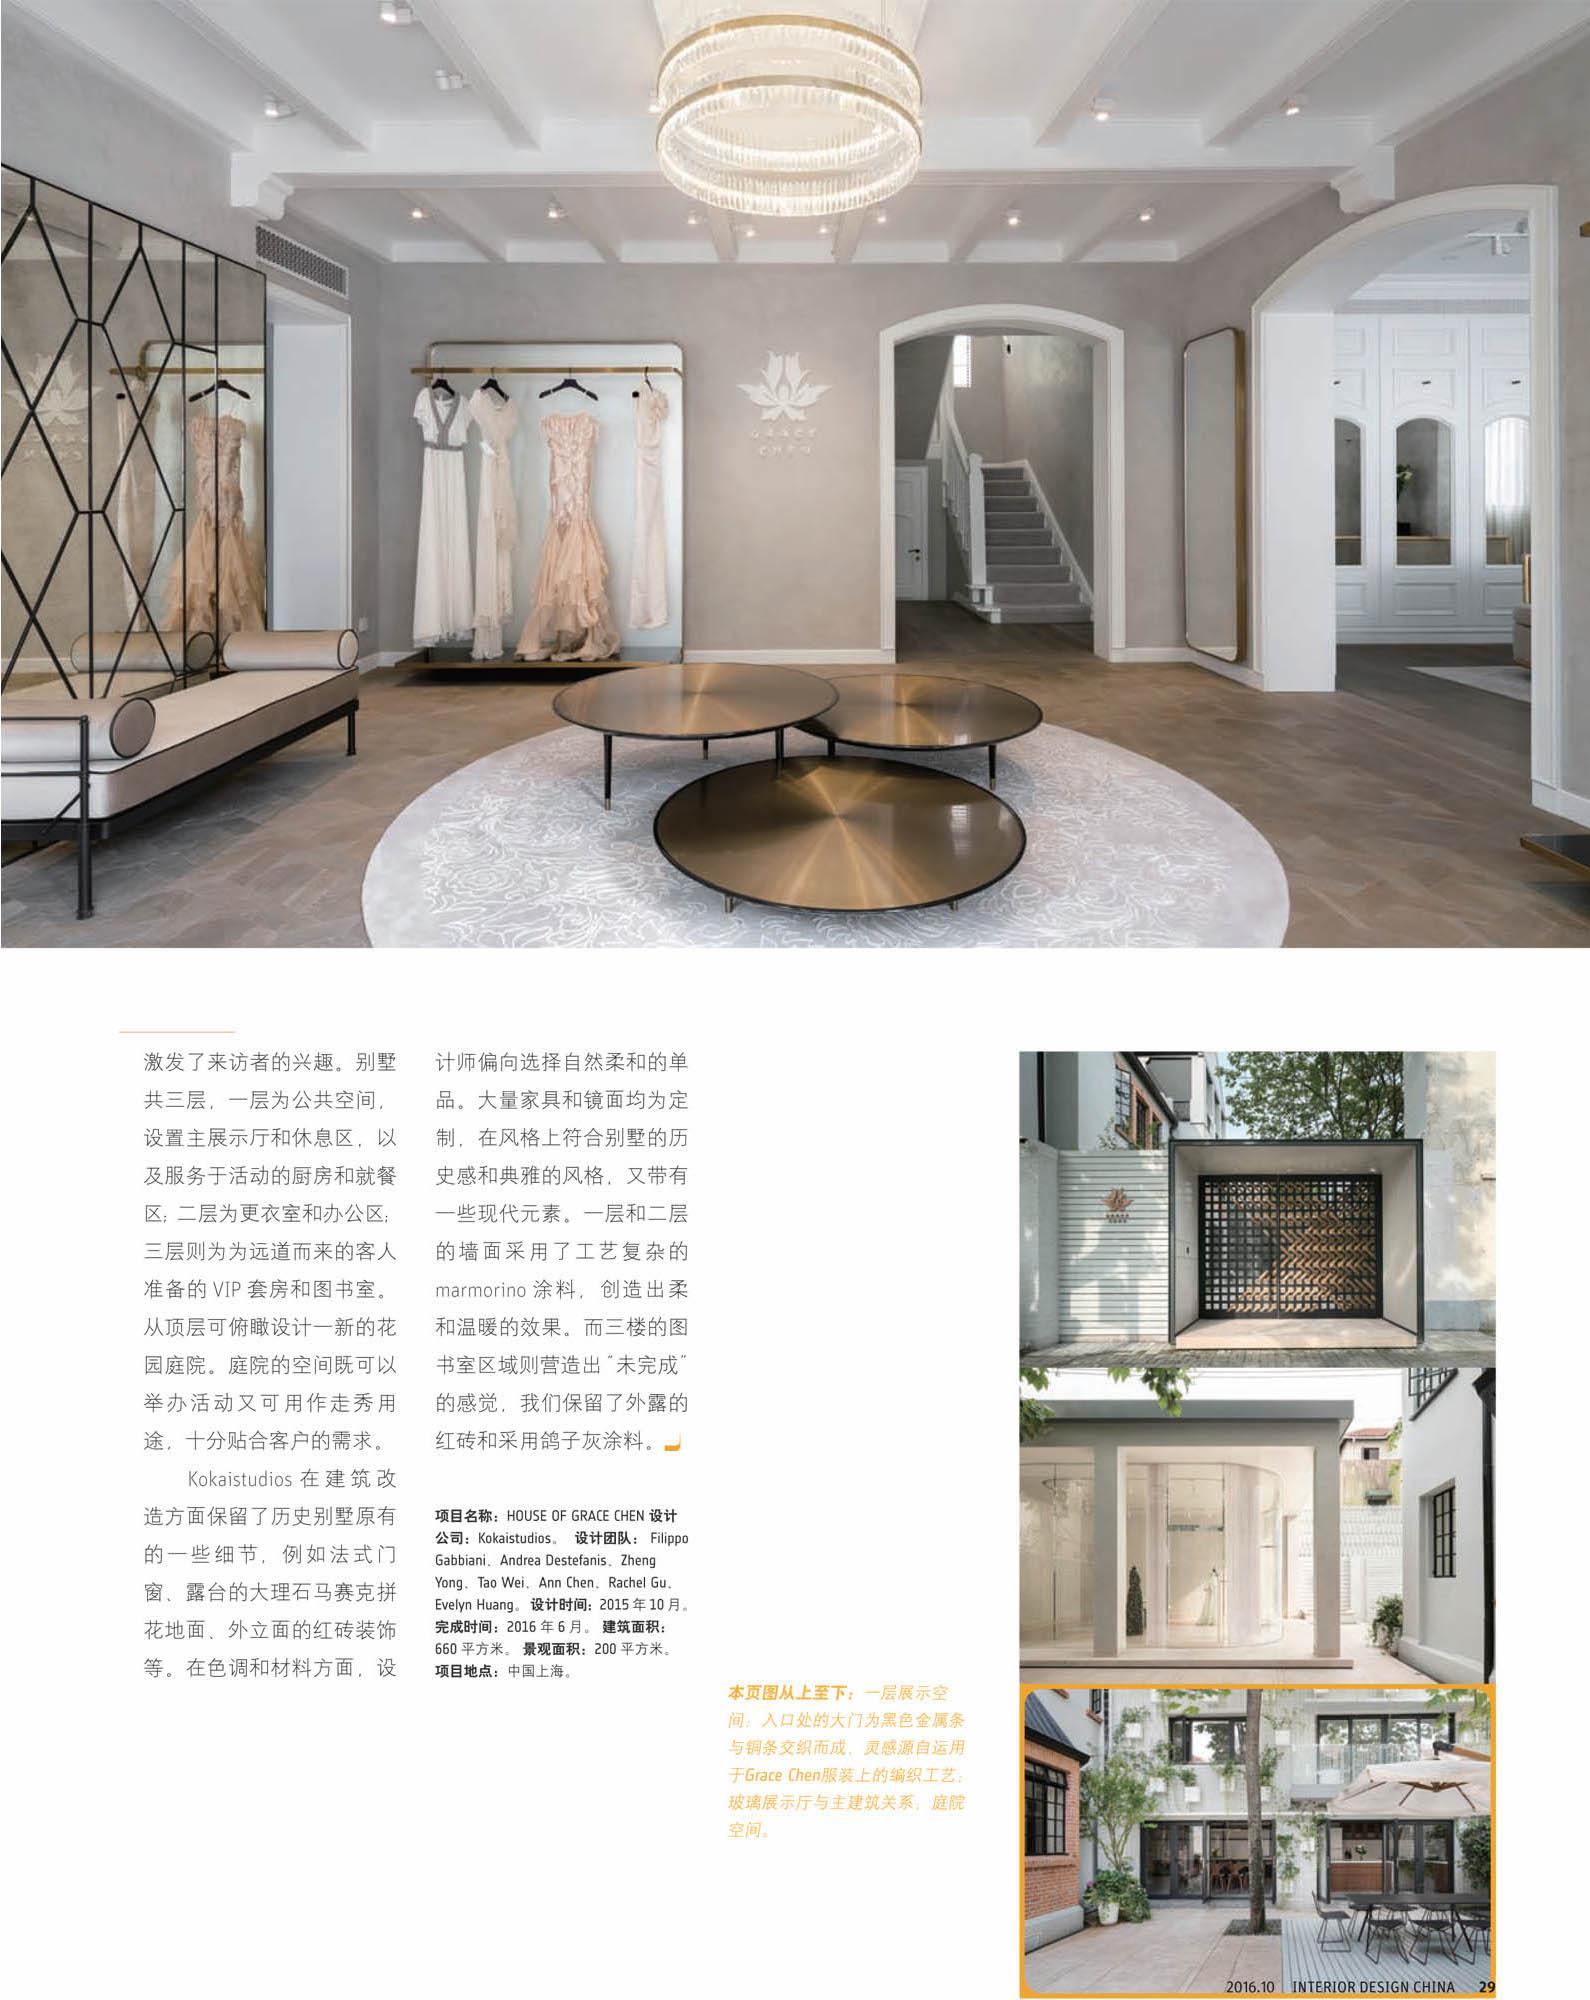 Interior Design China_201610_Grace Chen_3.jpg